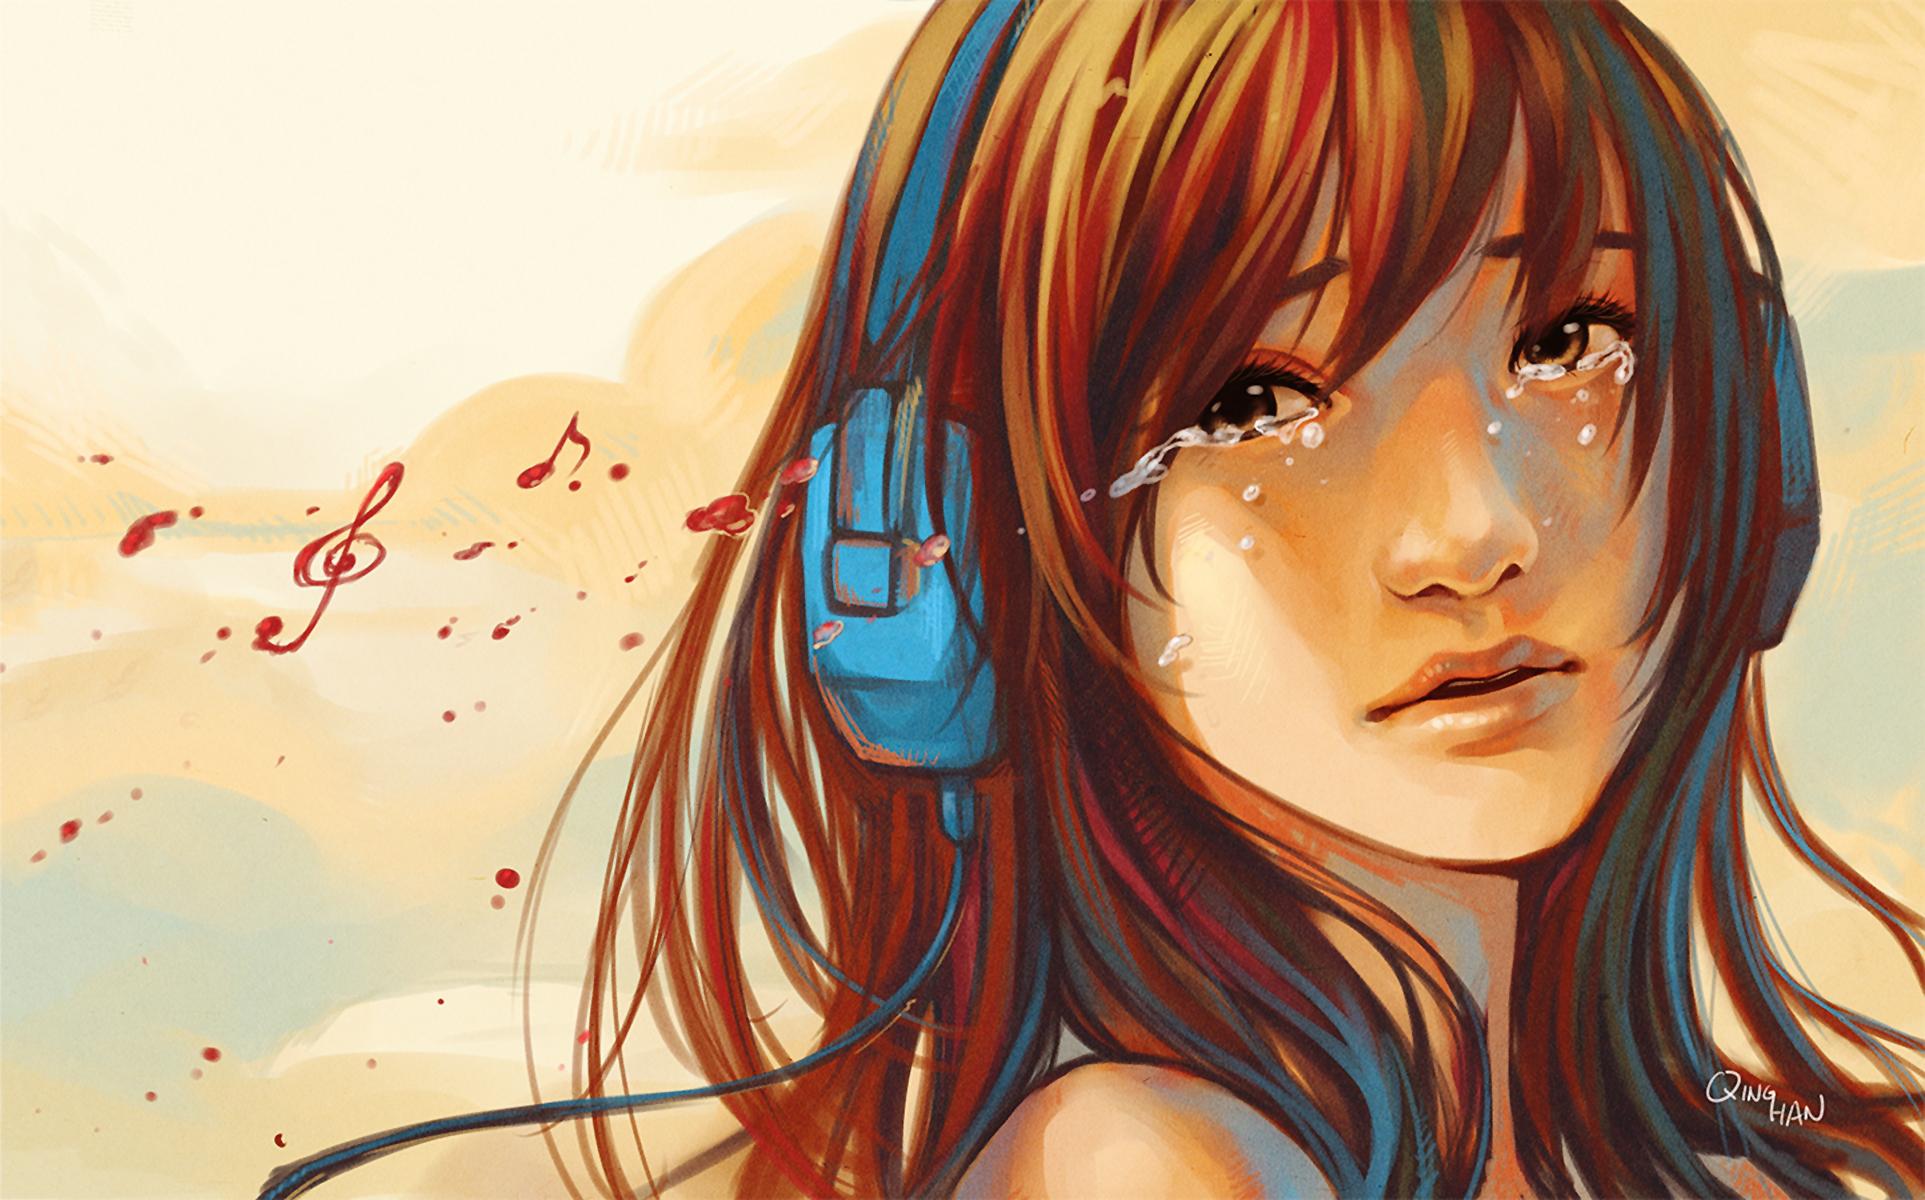 Sad Anime Girl Listening To Music Drawing - Gambarku